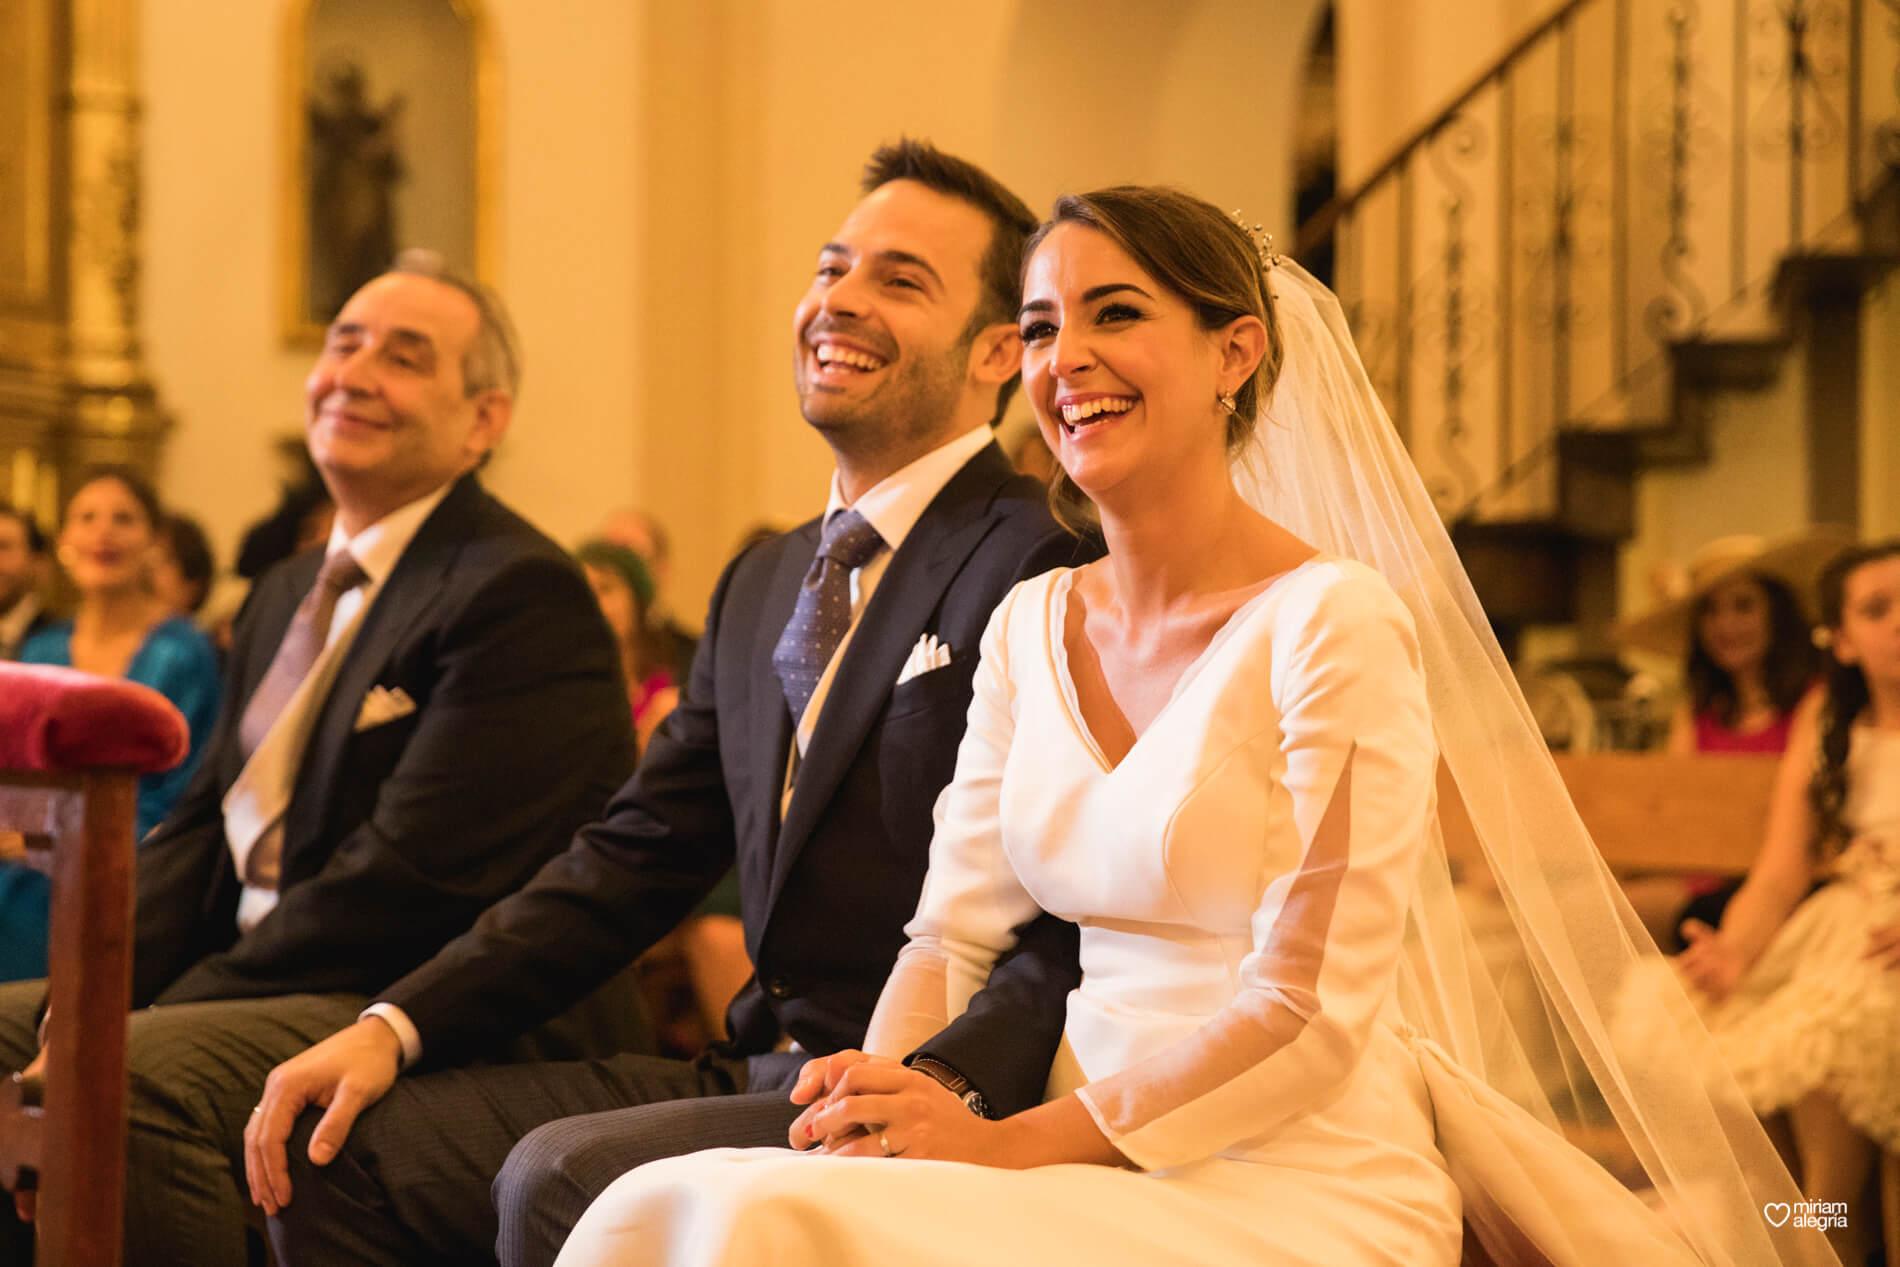 vestido-de-novia-paula-del-vas-miriam-alegria-fotografos-boda-murcia-68